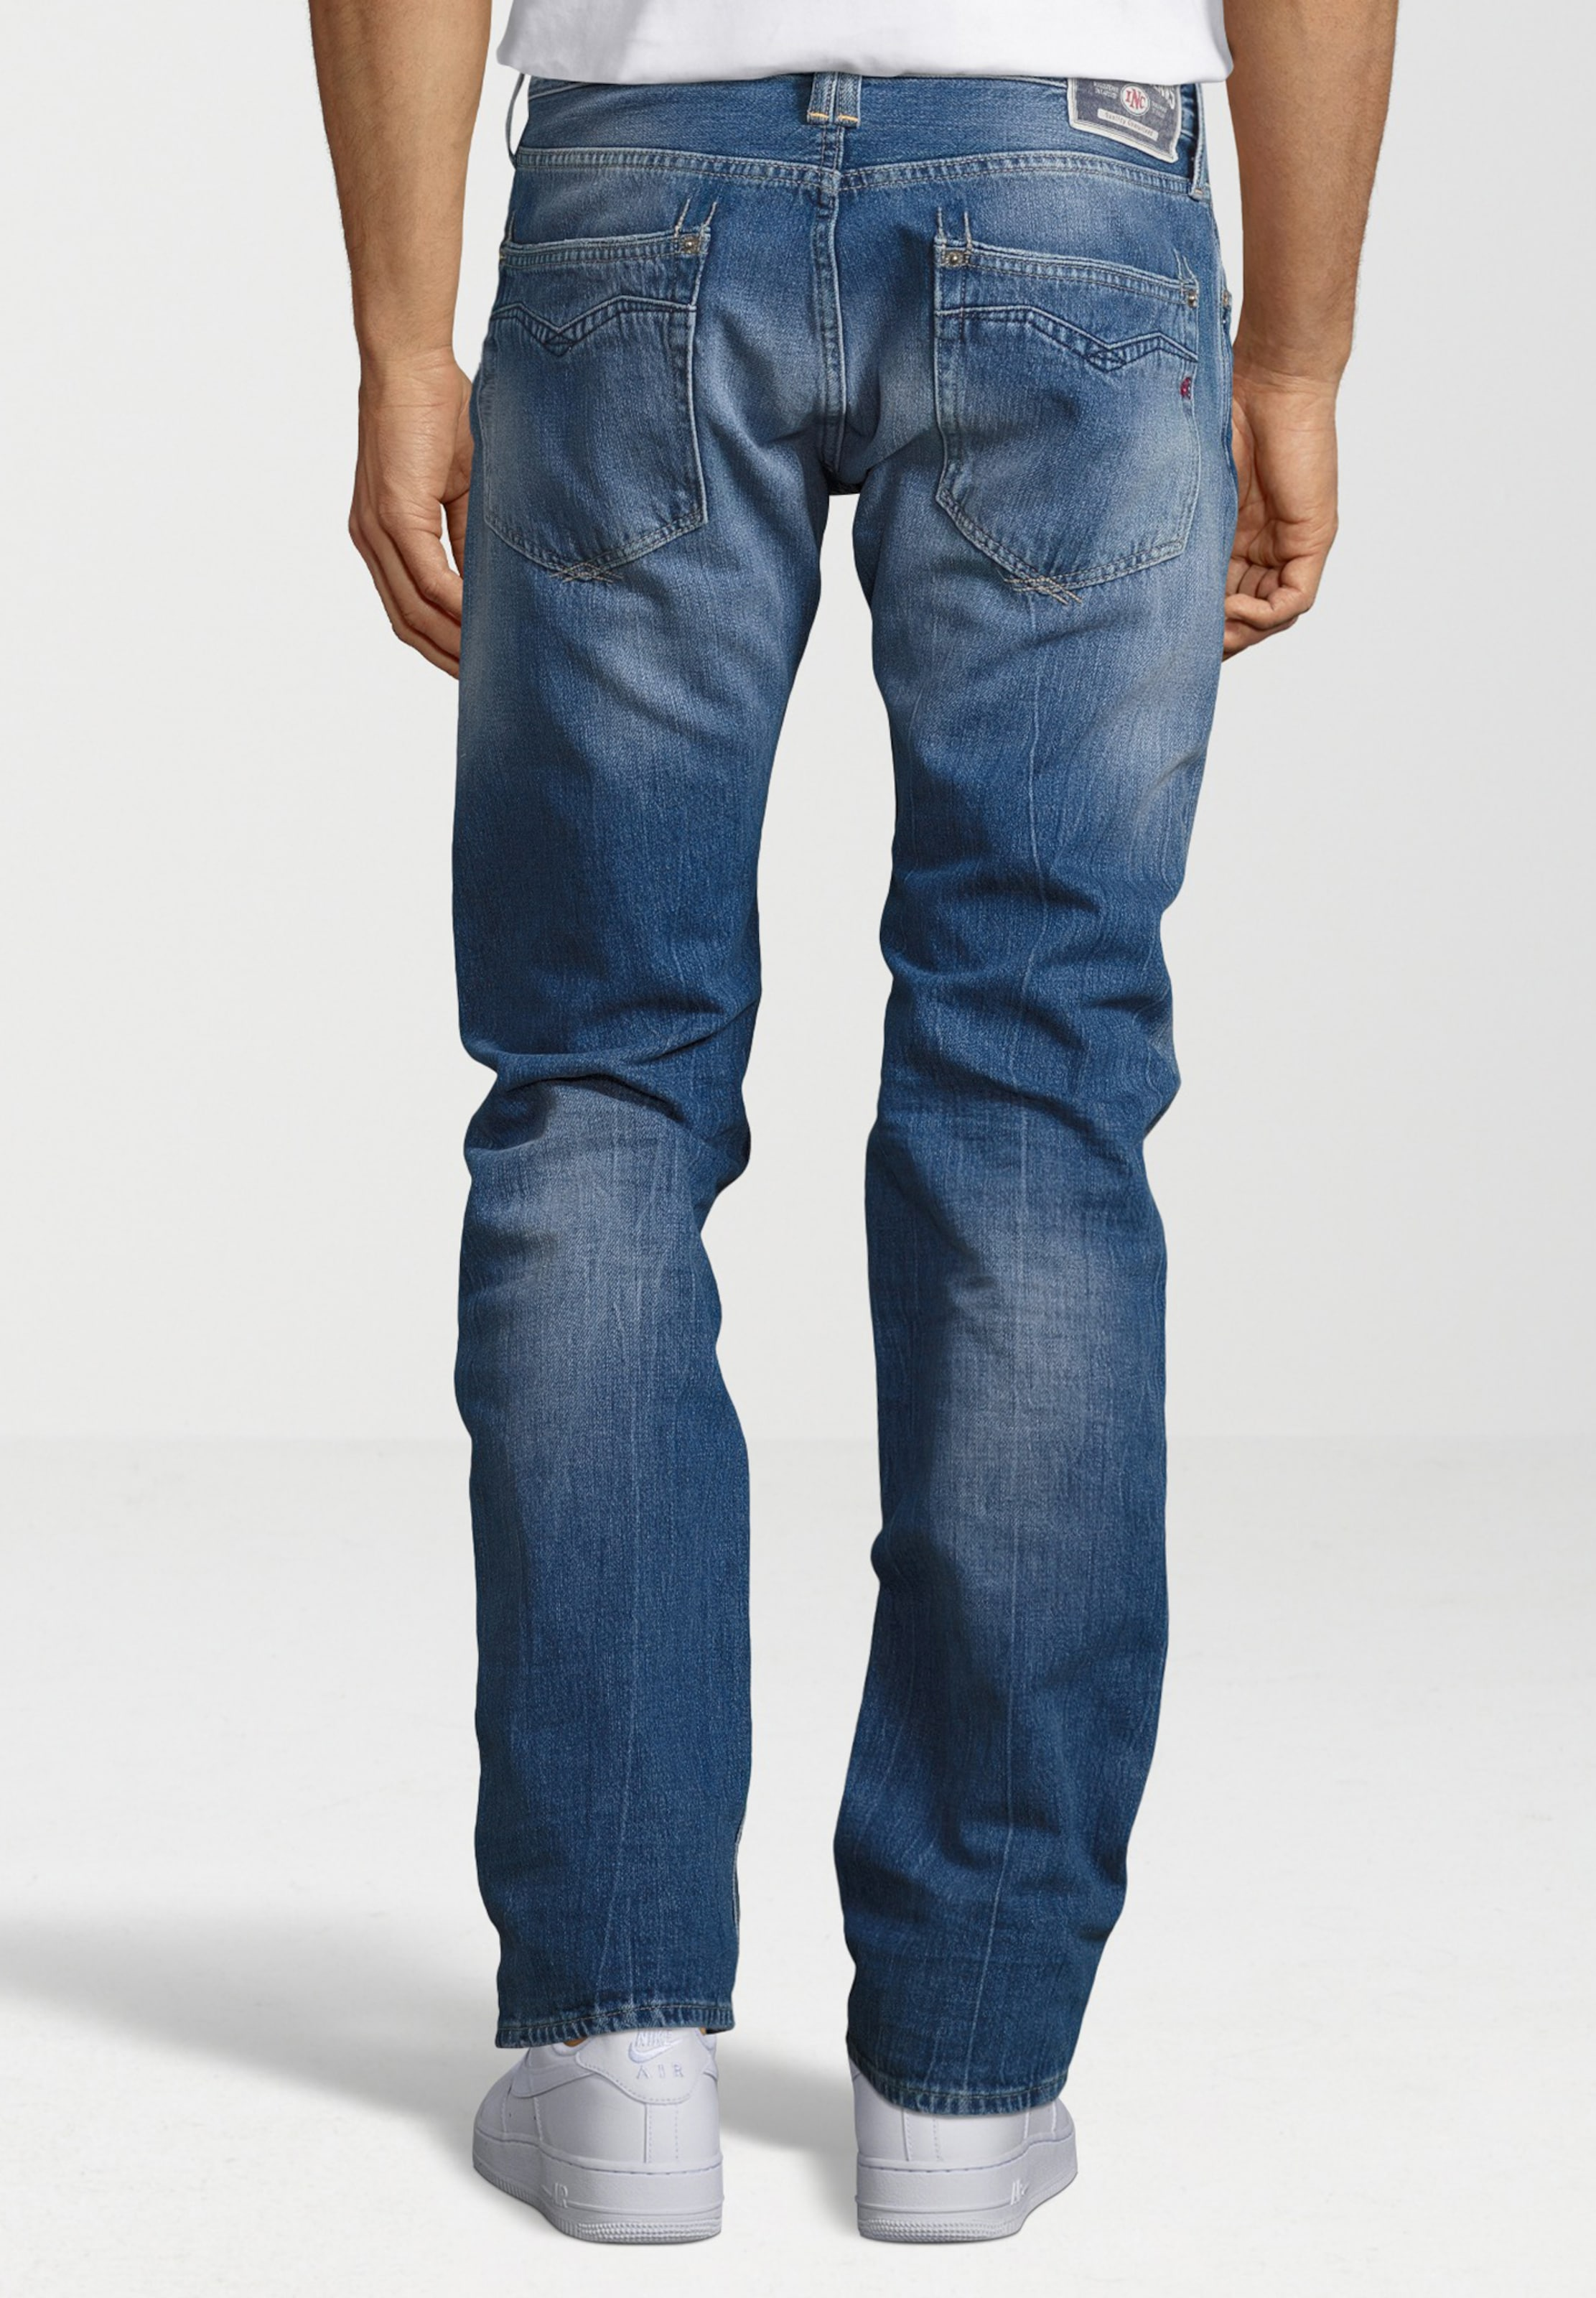 Blau Cotton In Denim' Replay Jeans 'newbill sdhQtr